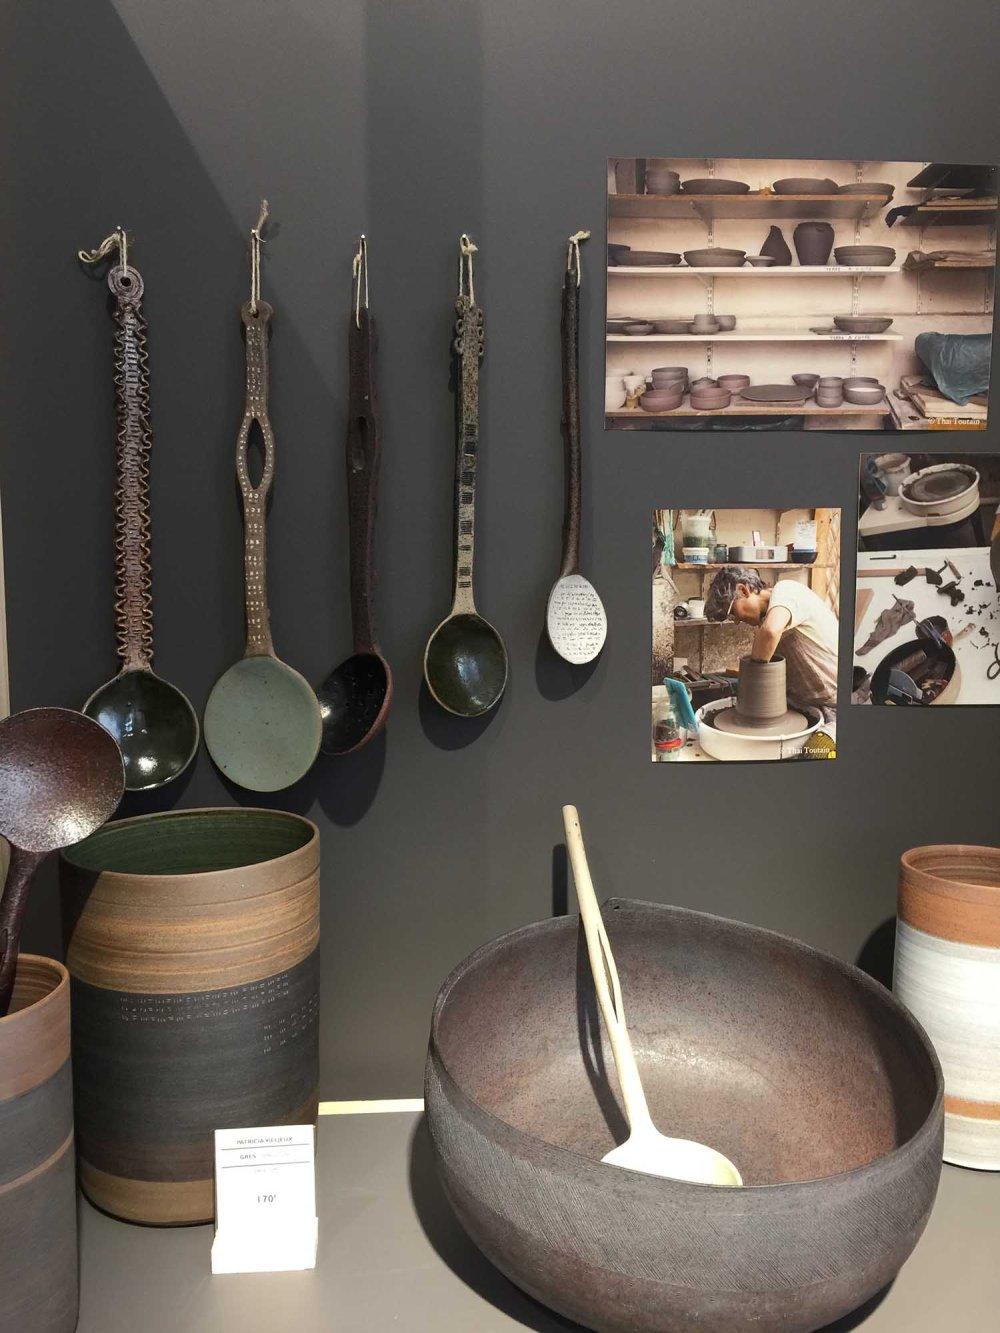 empreintes-ceramique-vaiselle